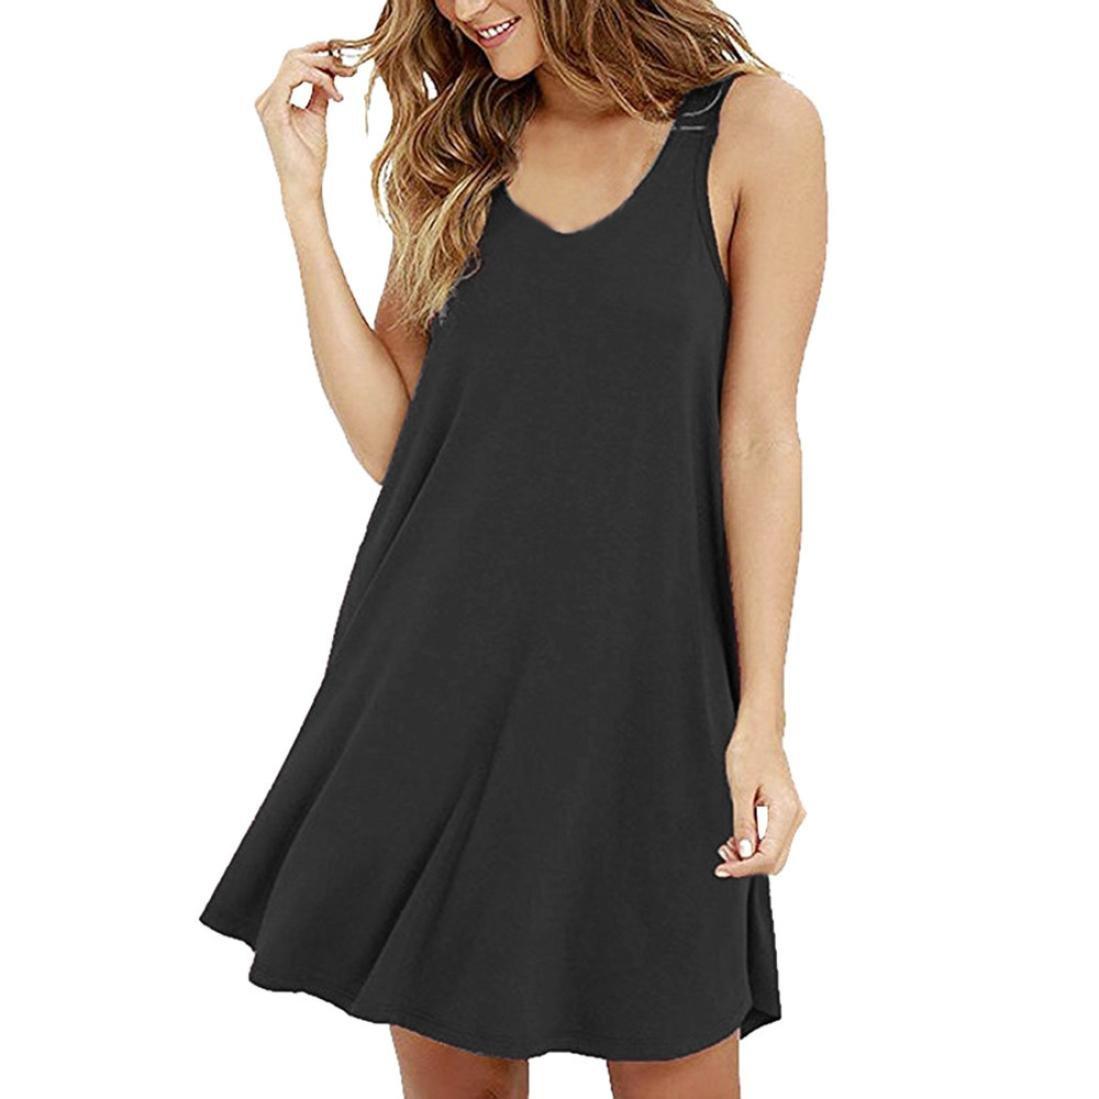 HODOD Women O Neck Casual Pockets Sleeveless Above Knee Dress Loose Party Dress (U Black, M)